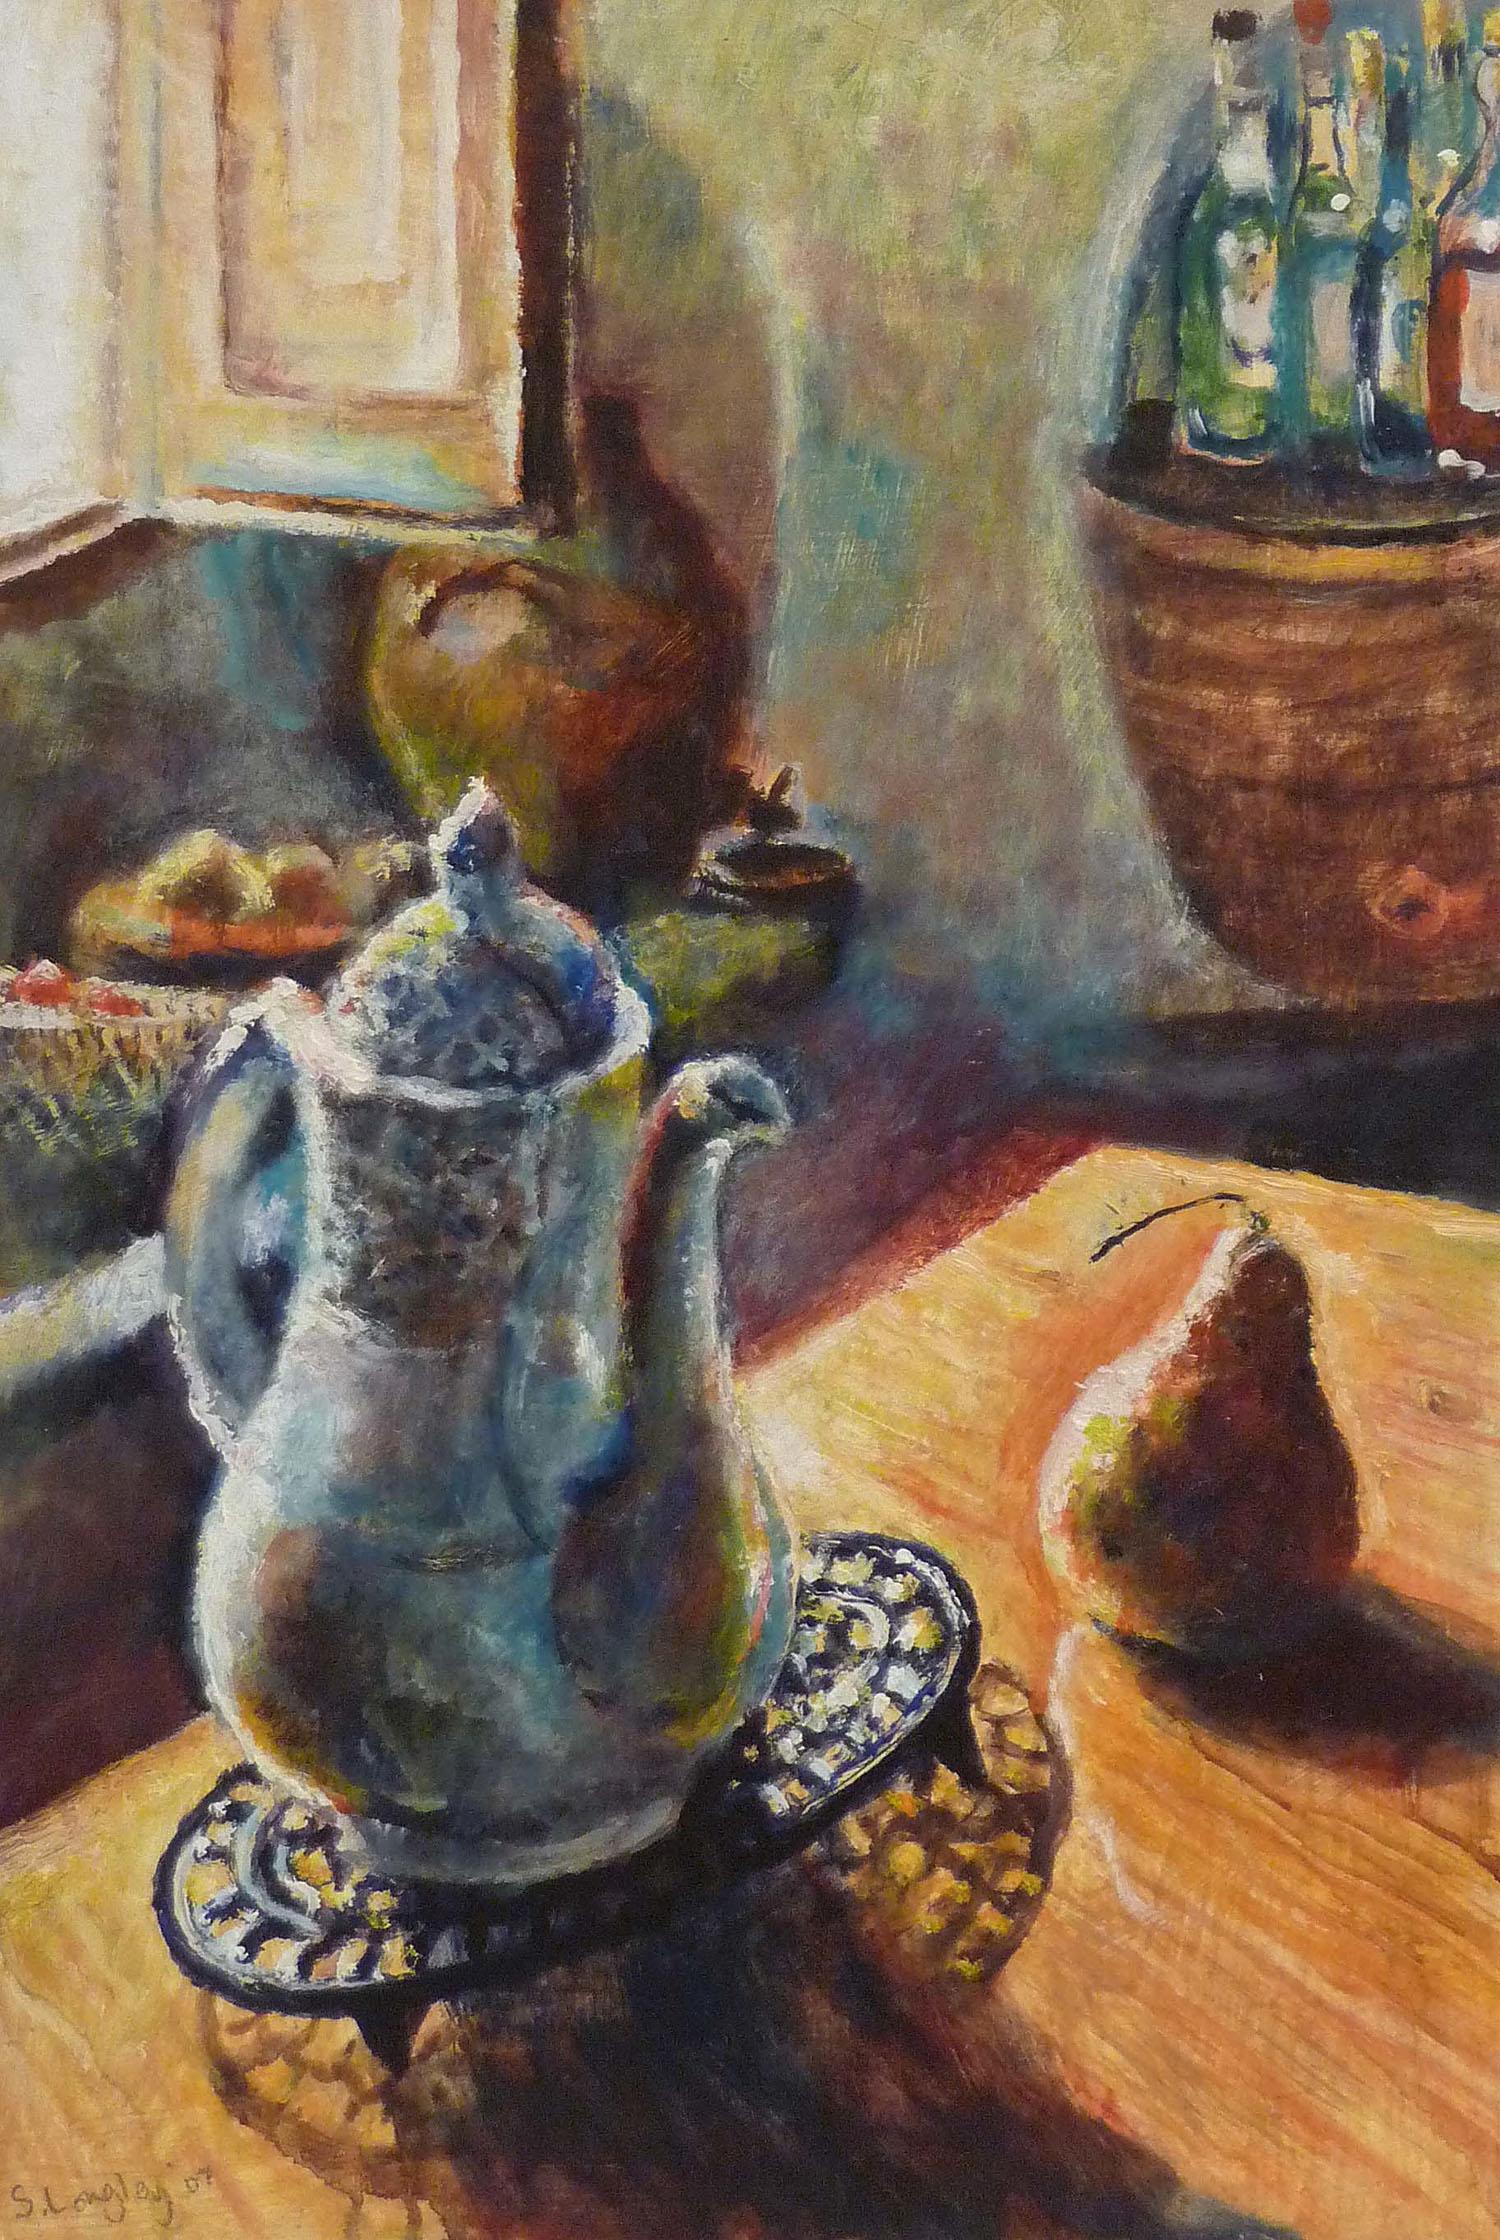 Sarah Longley_-_Coffee Pot and Pear_oil on board_45 x 31cm.jpg